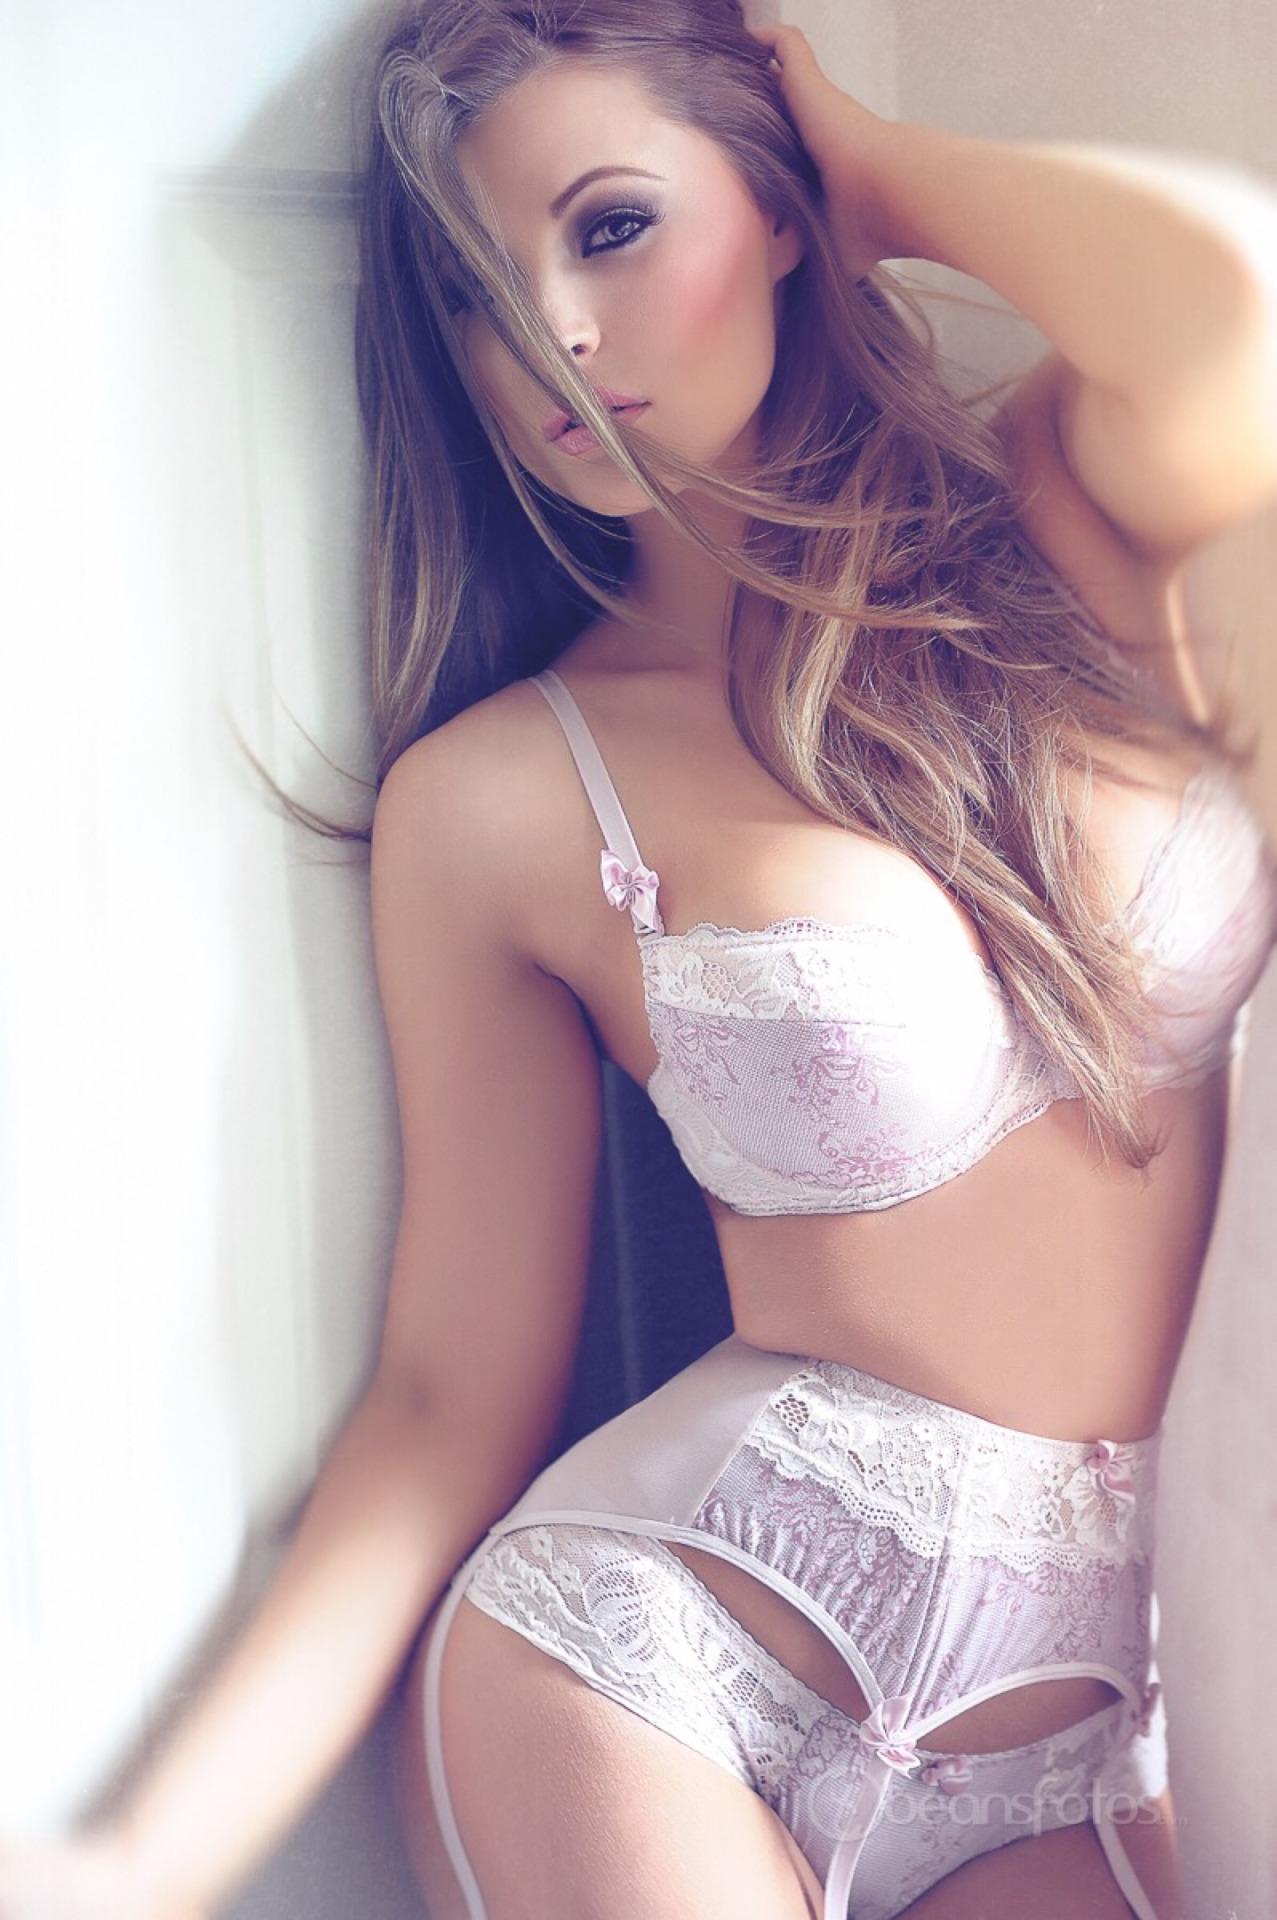 The lingerie toledo toledo undergarments womens have